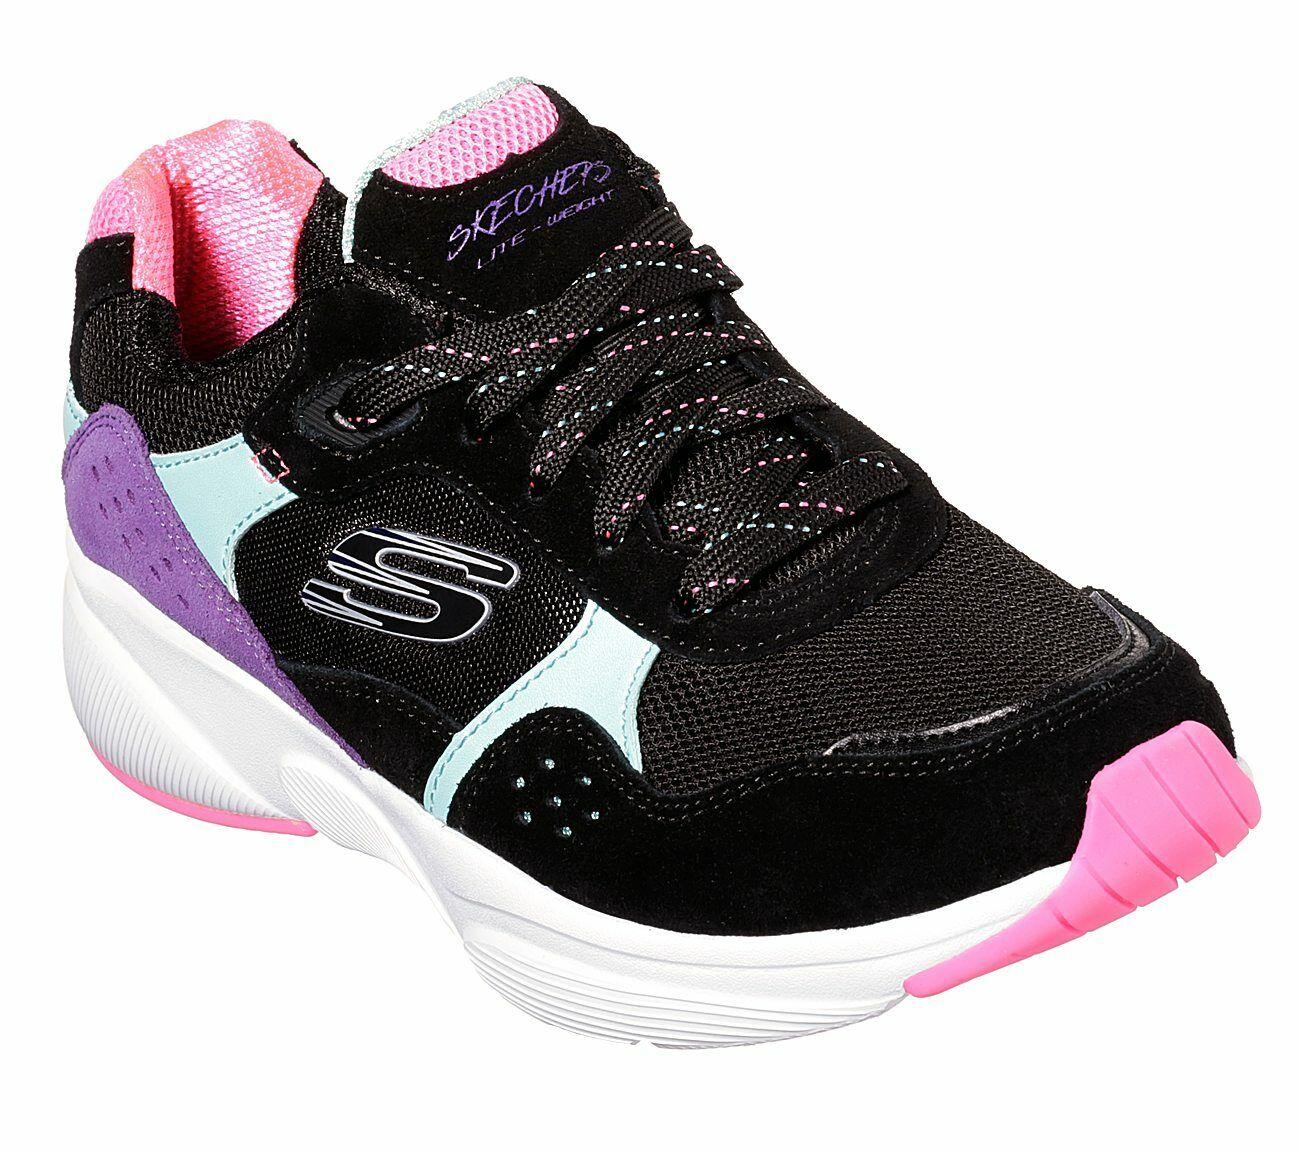 NUOVO Skechers Scarpe da Donna Scarpe scarpe da ginnastica Meridian no worries Scarpe da Corsa Walking